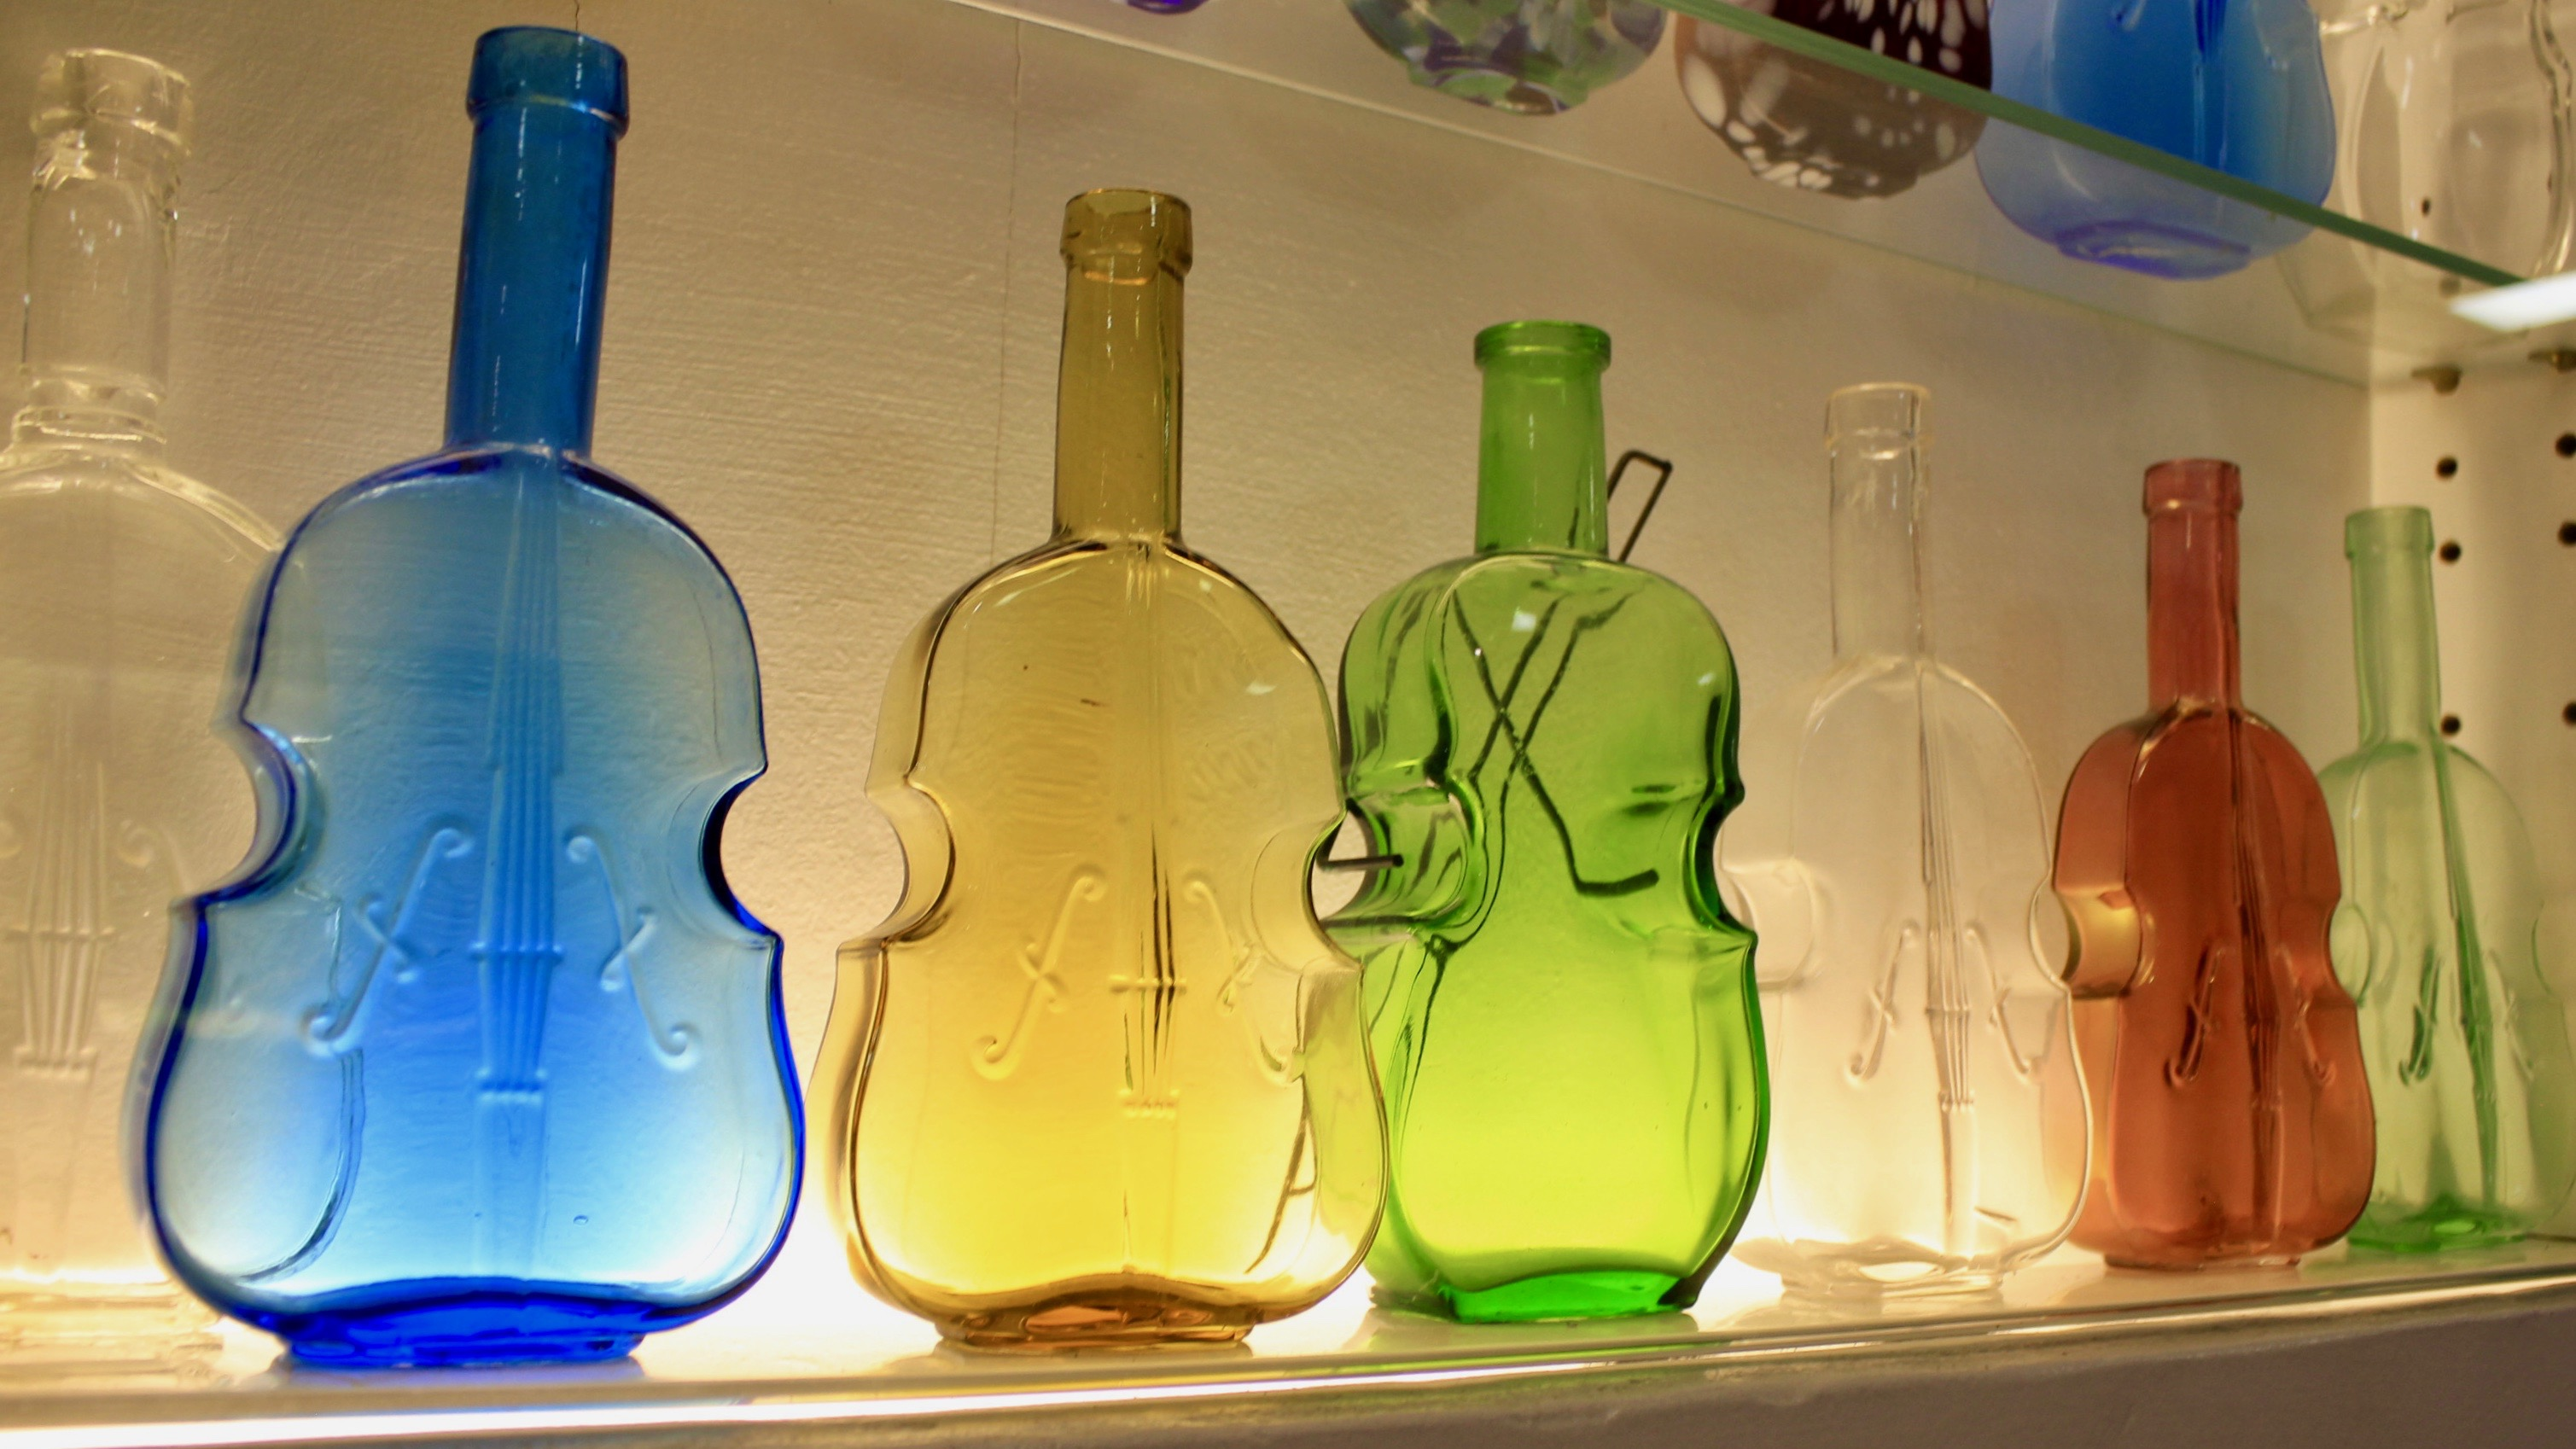 V.com weekend vote: How many violin-shaped knick-knacks do you own?